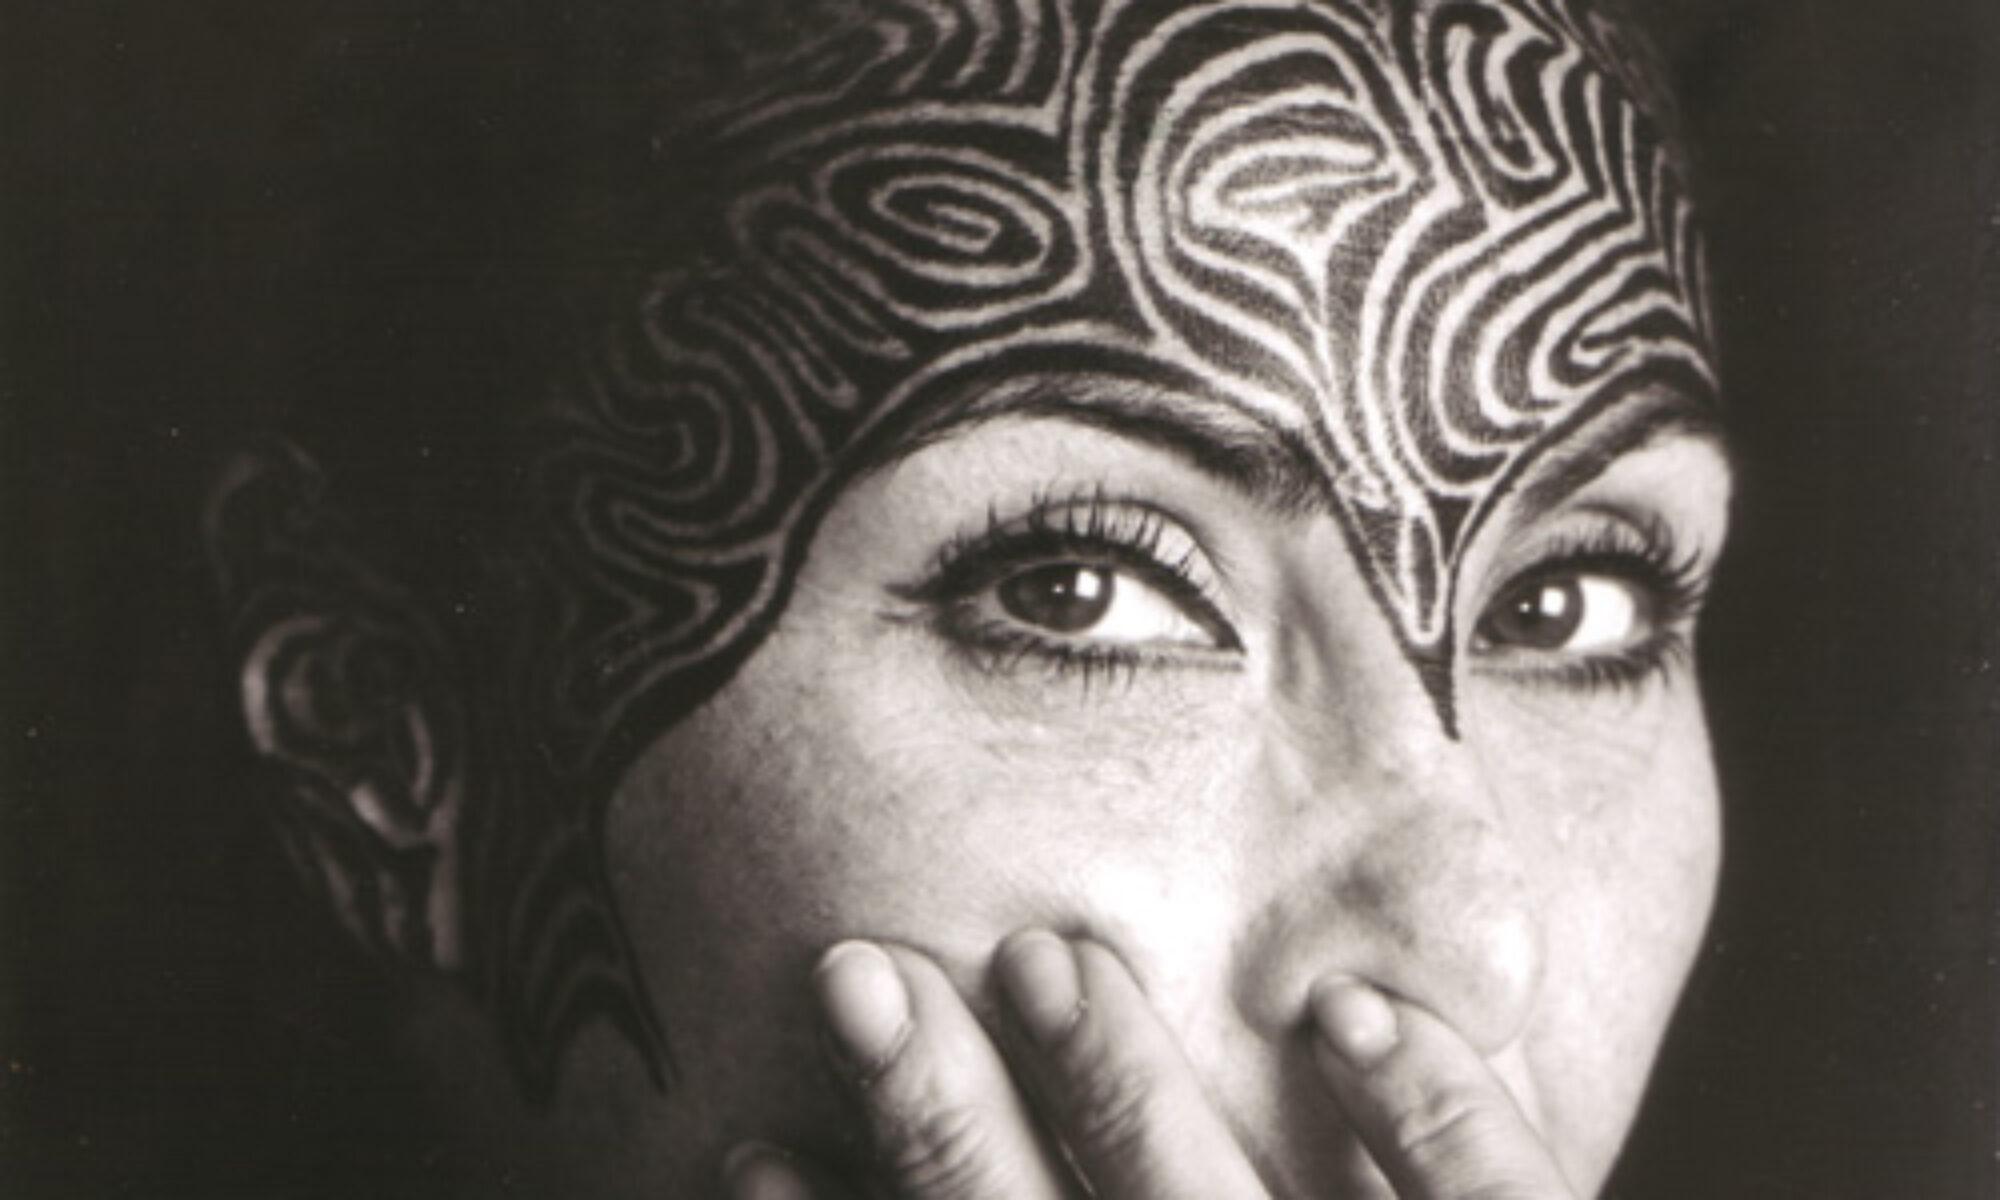 Fatima Scialdone